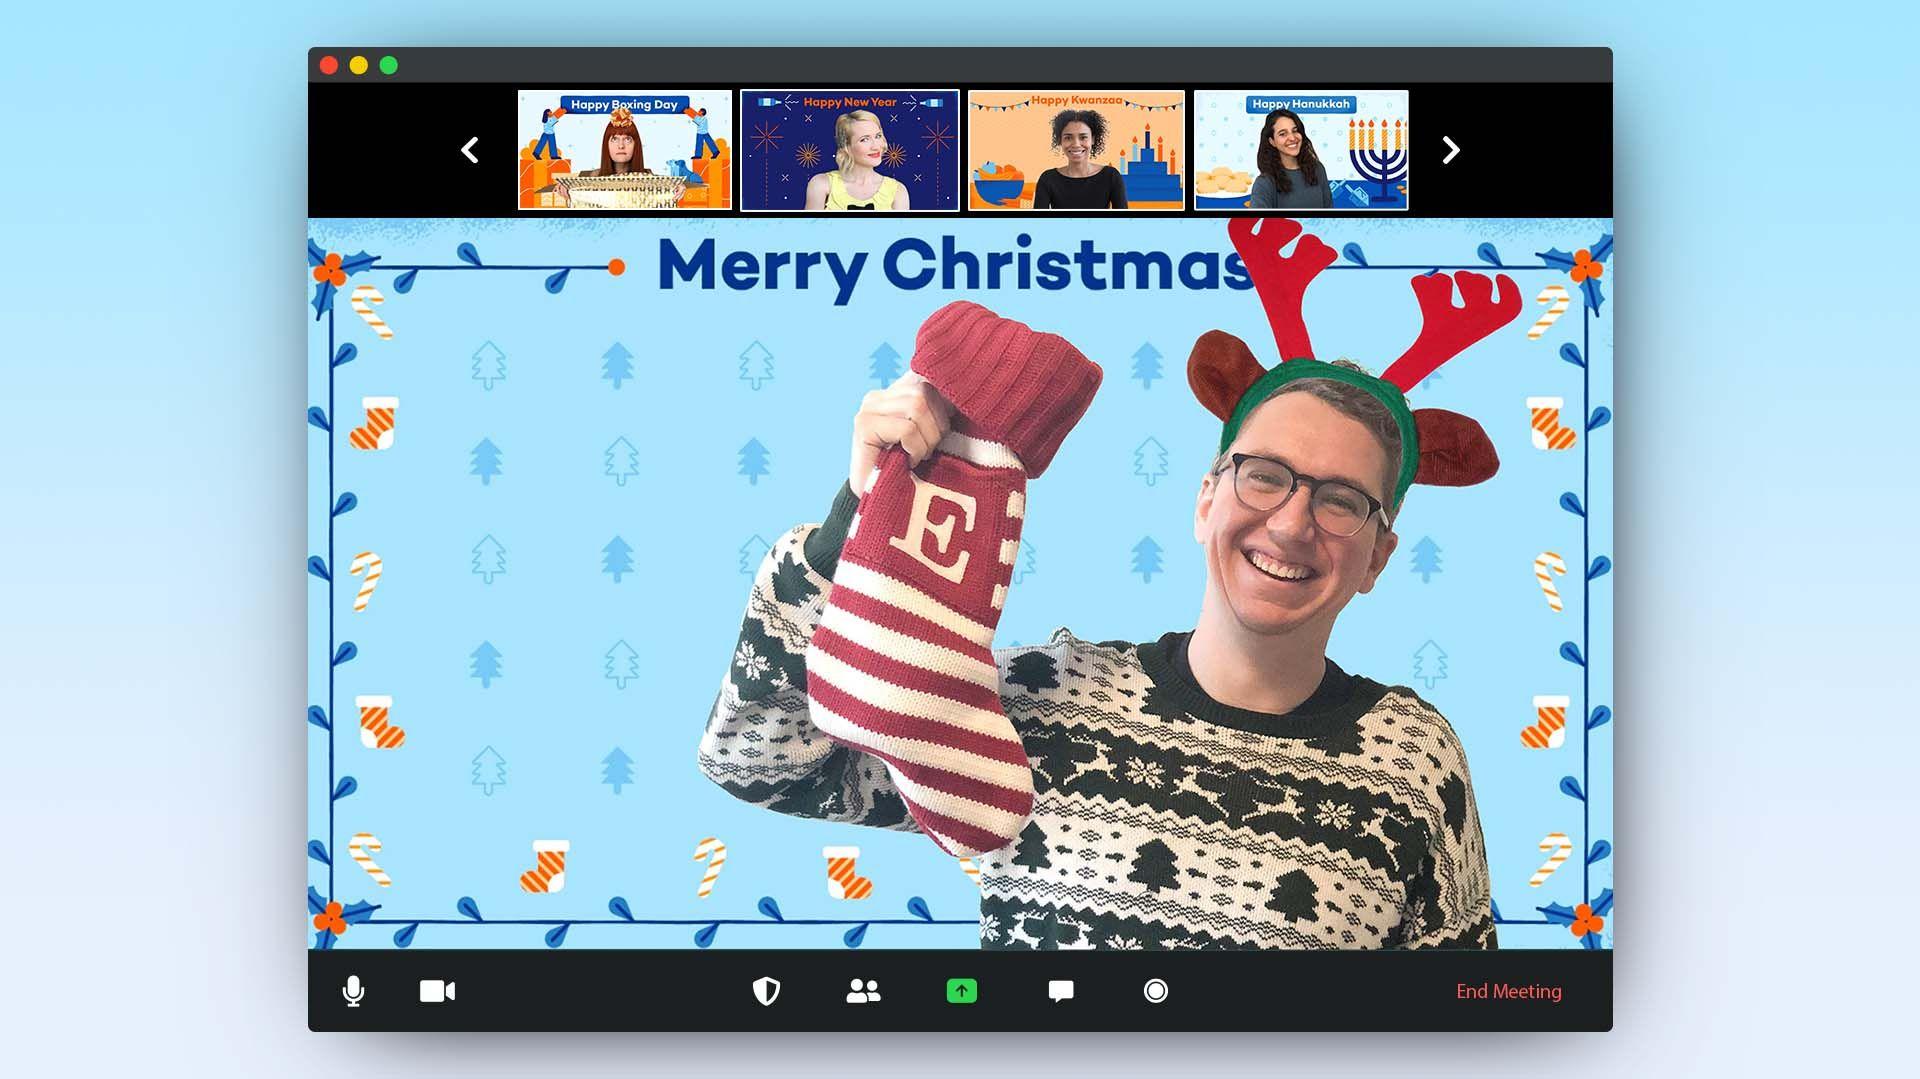 holiday-zoom-background-christmas